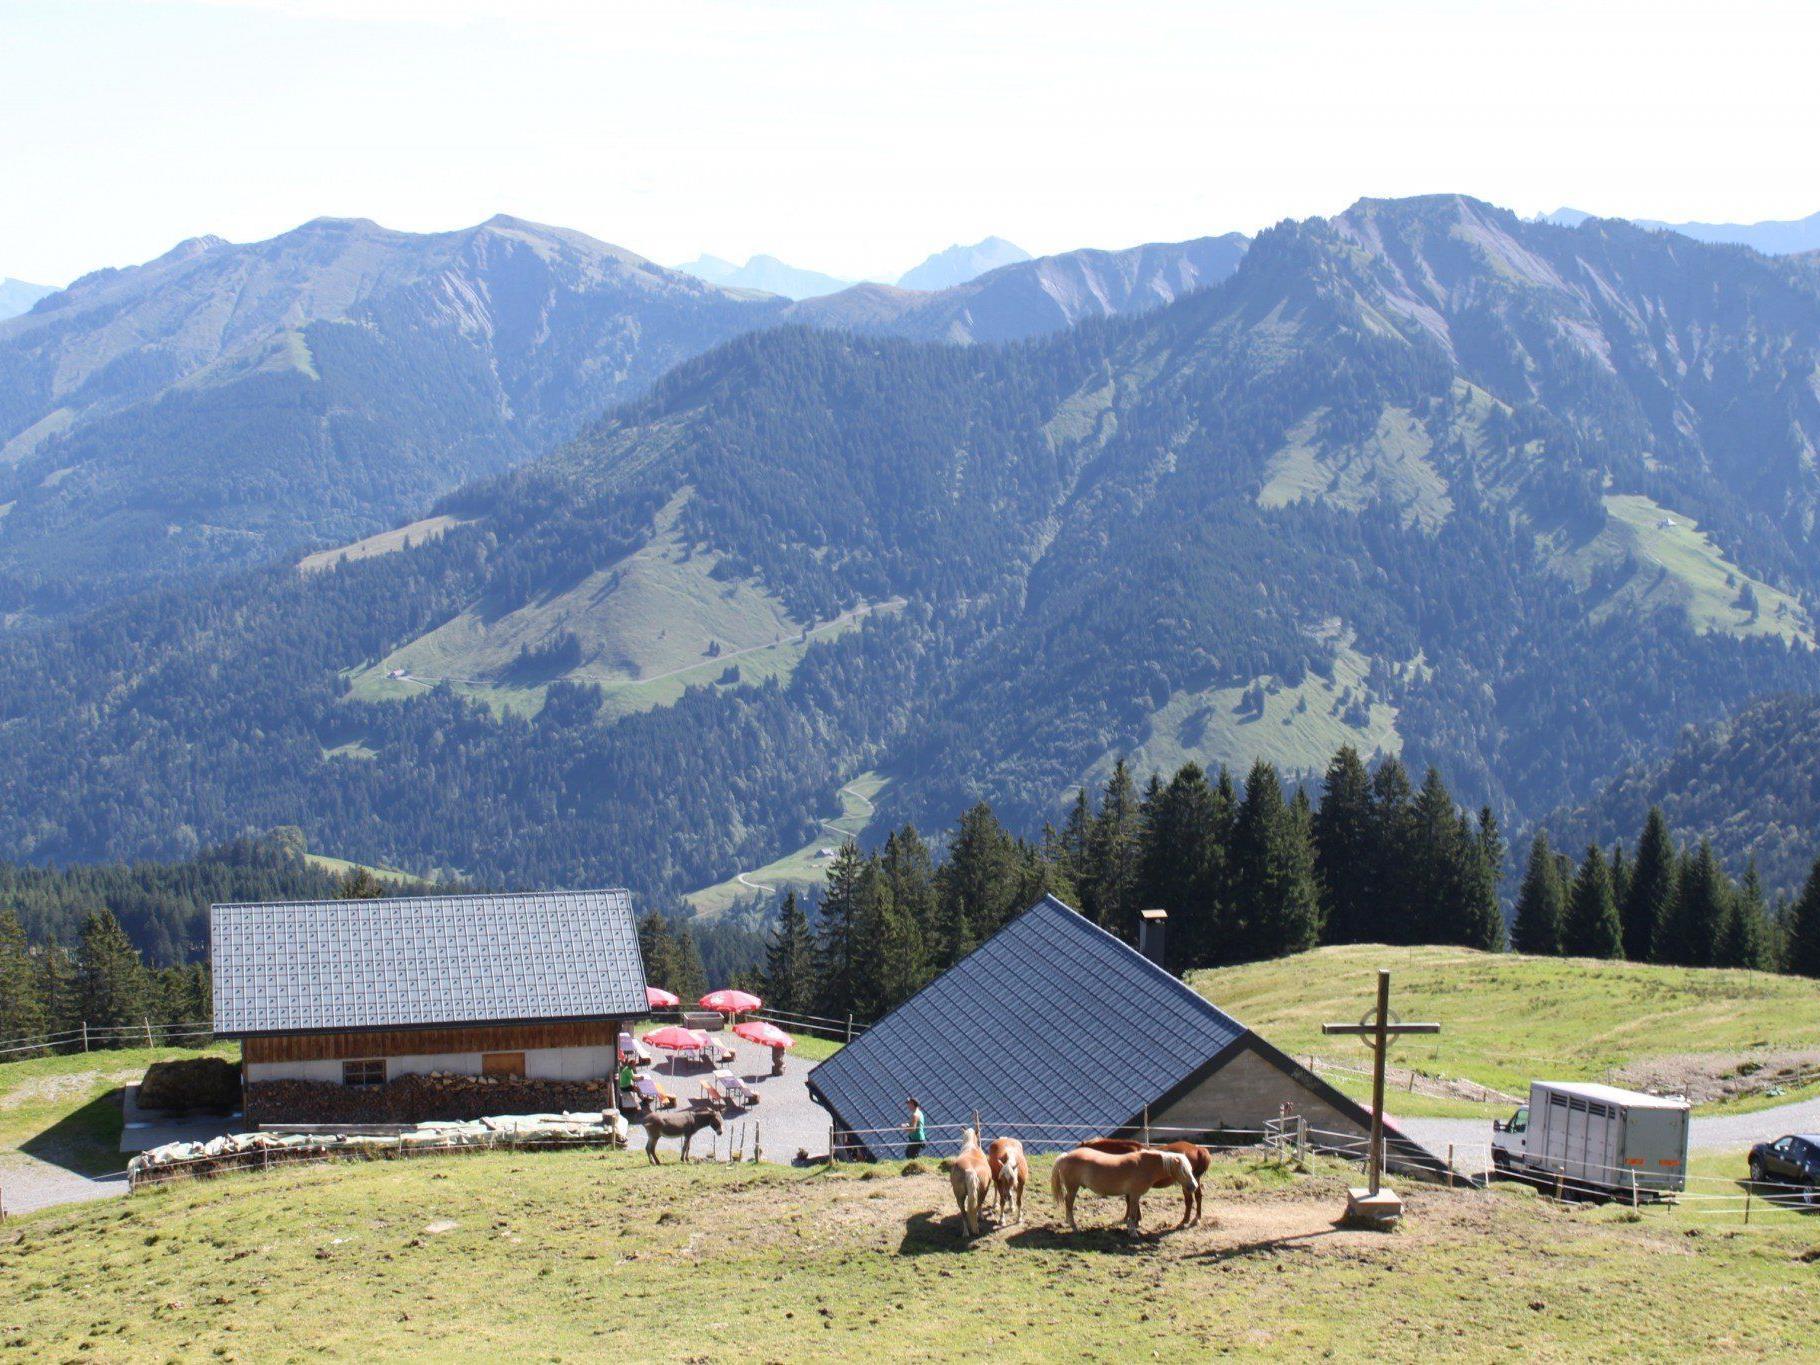 Termine Alpmessen Fraxern: Alpe Hohe Kugel, Sonntag, 20. Juli, 11 Uhr. Alpe Maiensäss, Sonntag, 17. August, 11.30 Uhr.